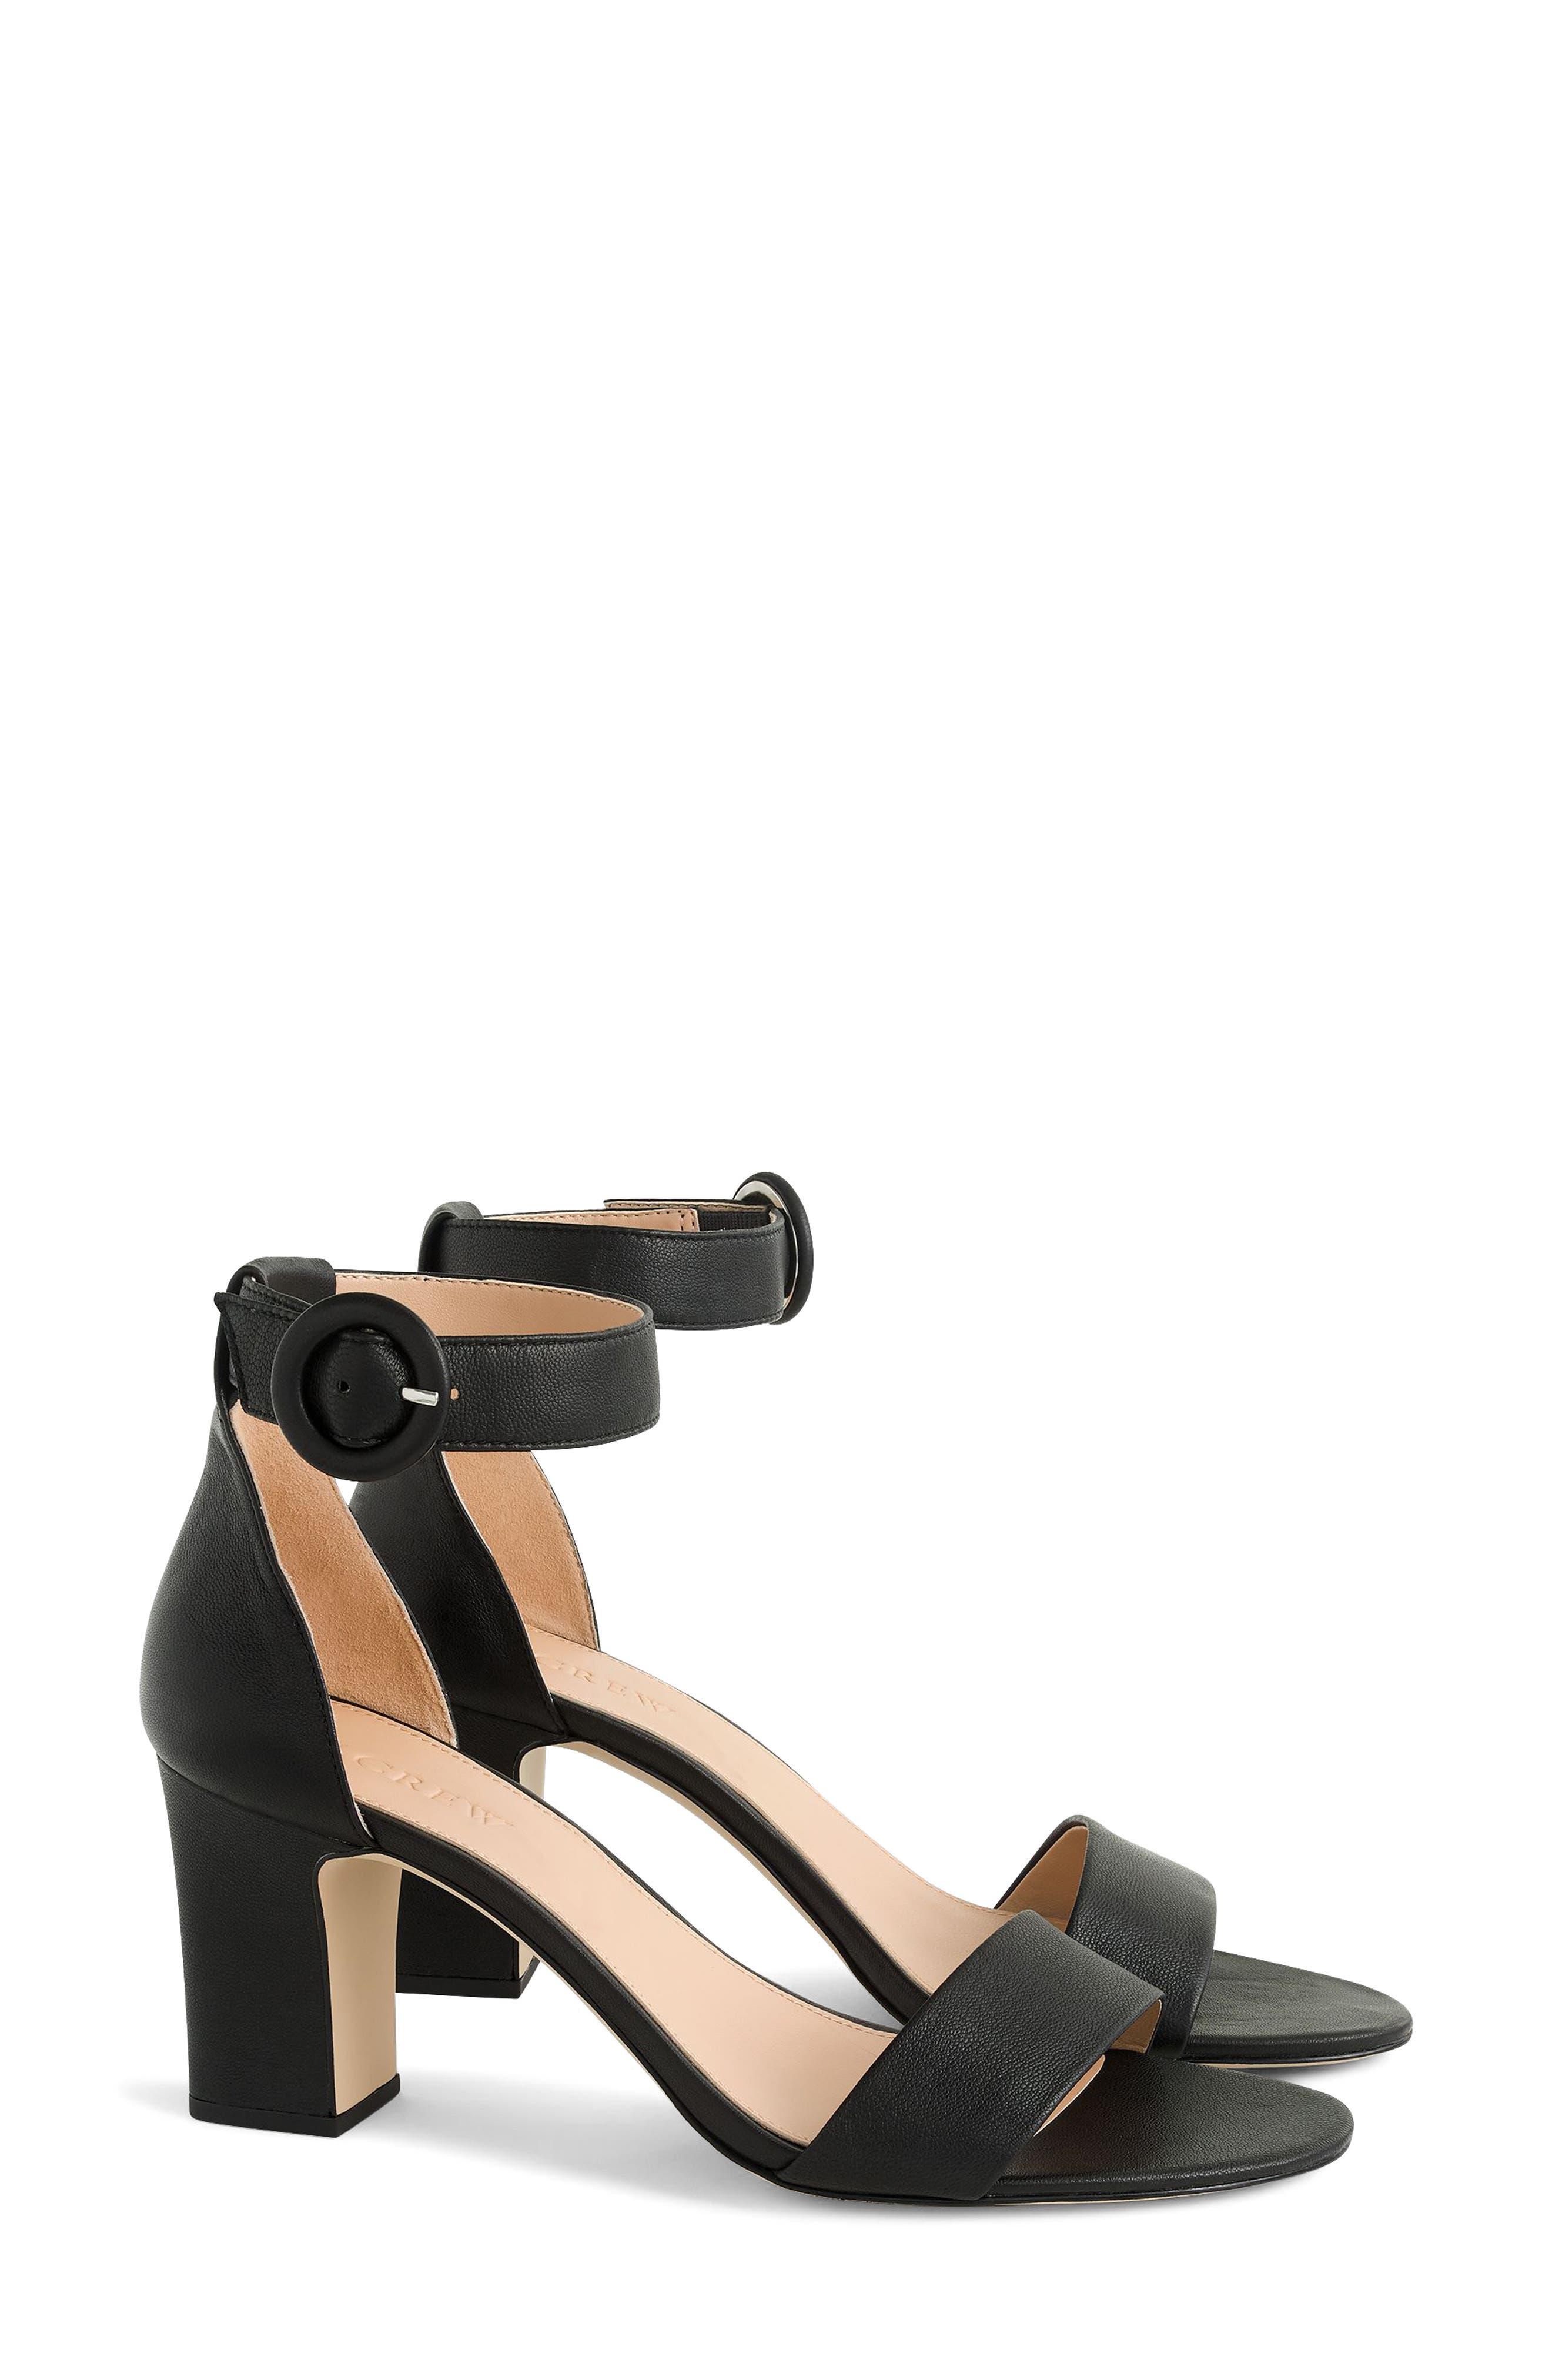 Remi Ankle Strap Sandal,                         Main,                         color, Black